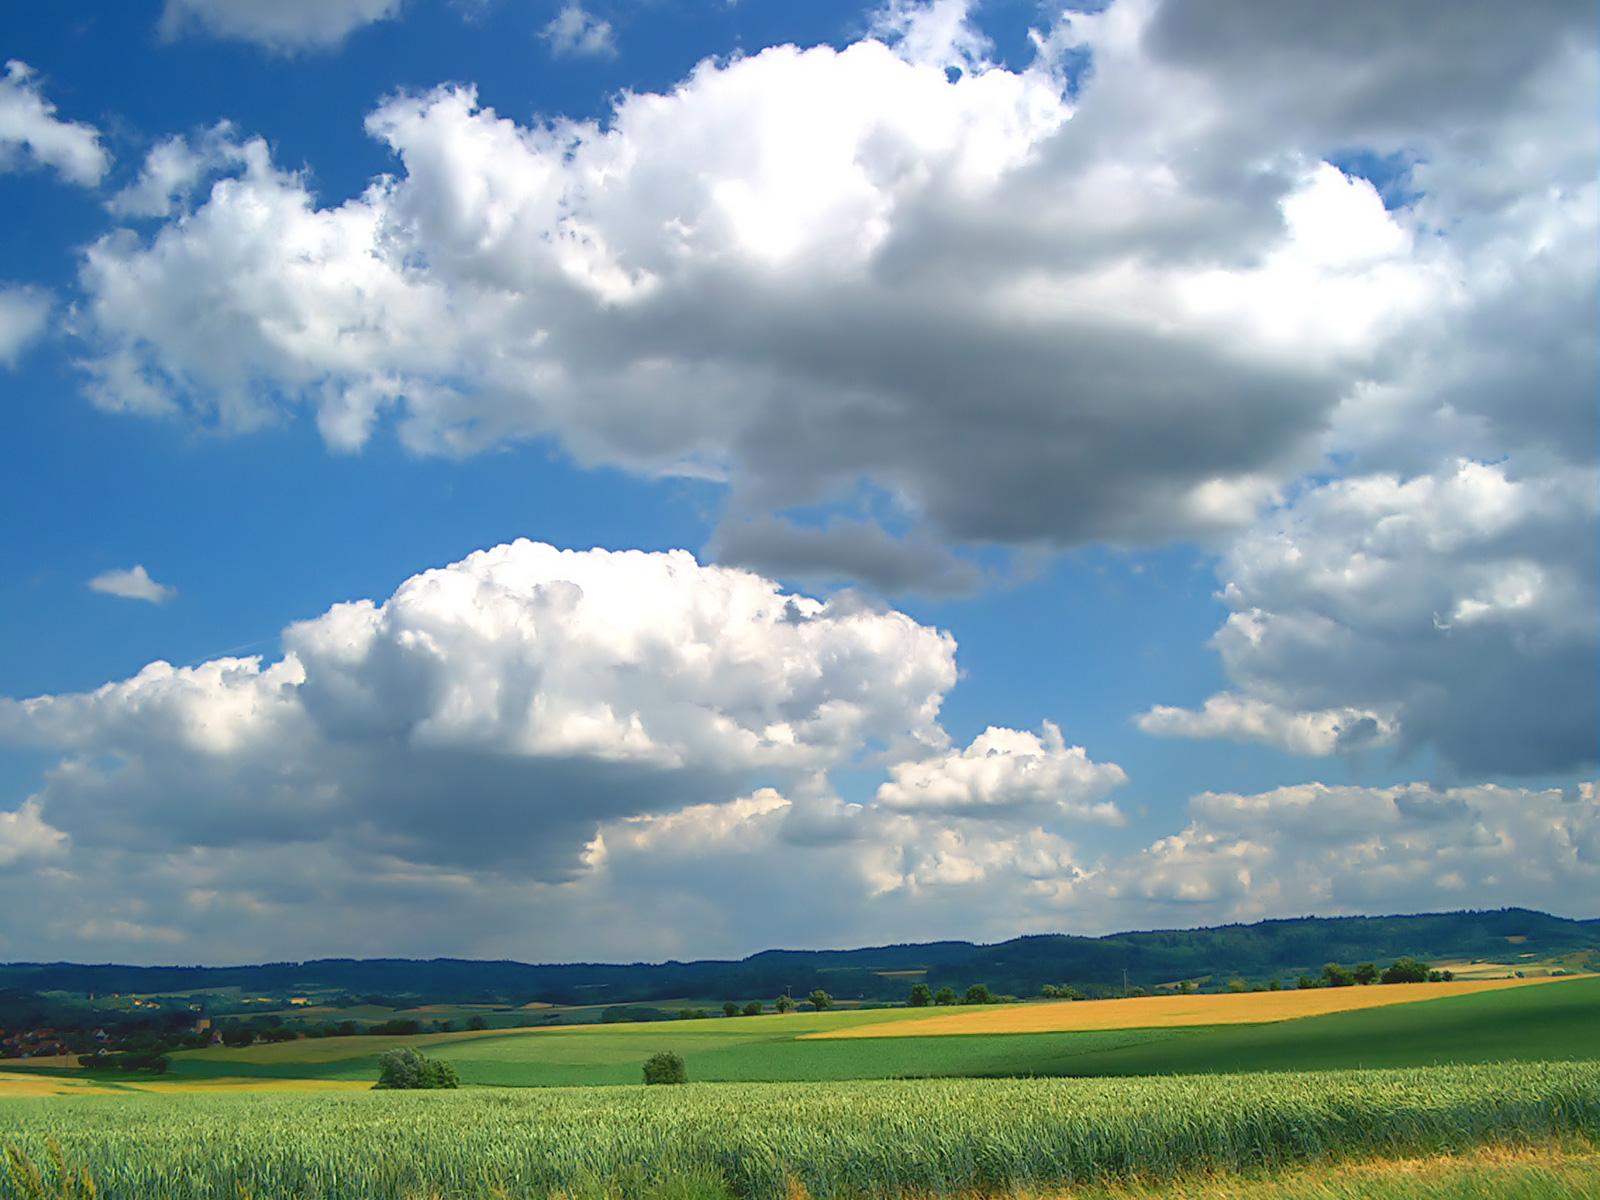 http://fc01.deviantart.com/fs20/f/2007/231/a/6/Cloudy_by_Richi_Ric.jpg